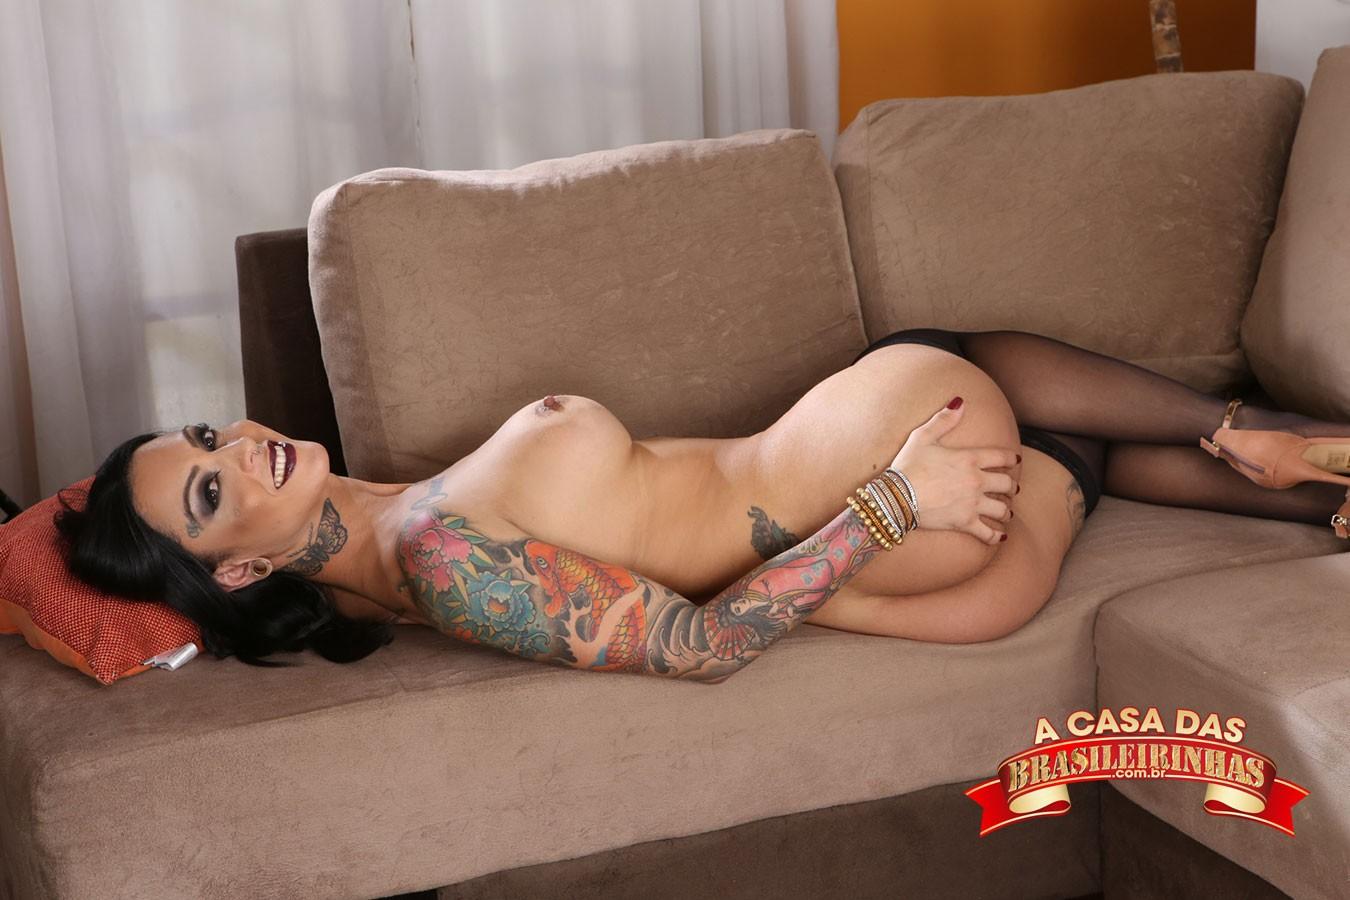 gata-tatuada-pelada-no-sofa.jpg